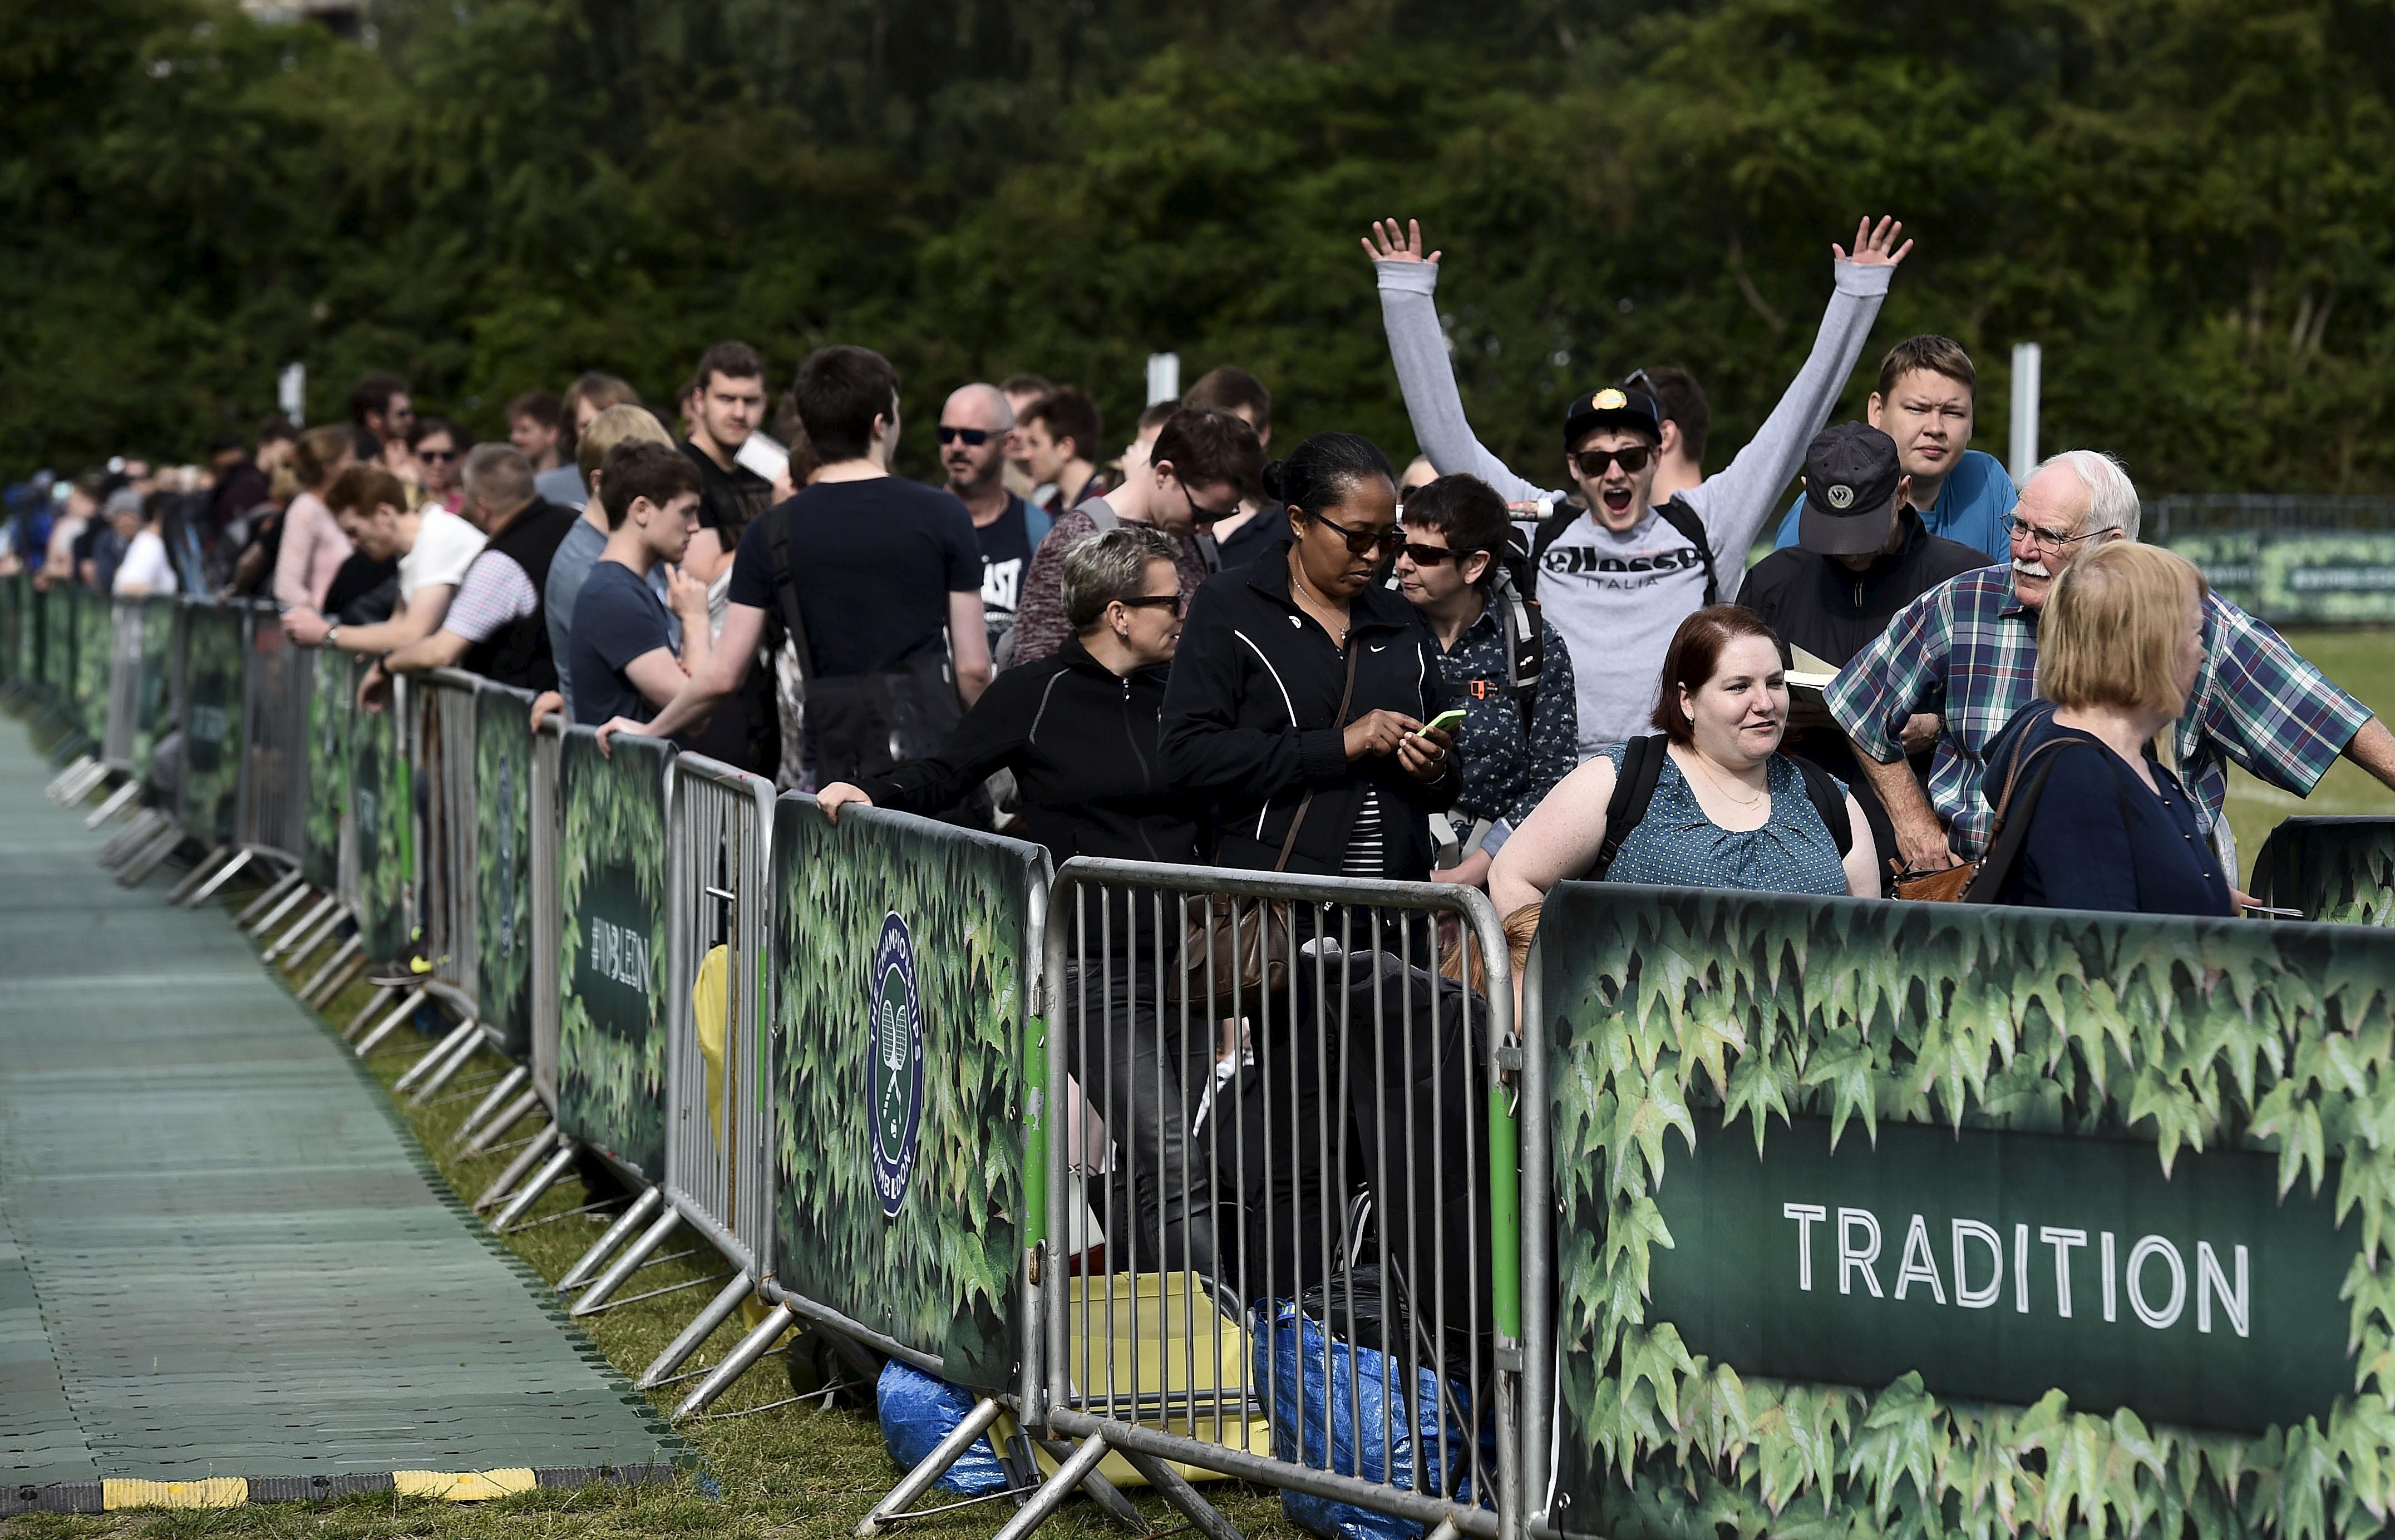 Wimbledon tennis fans wait in line